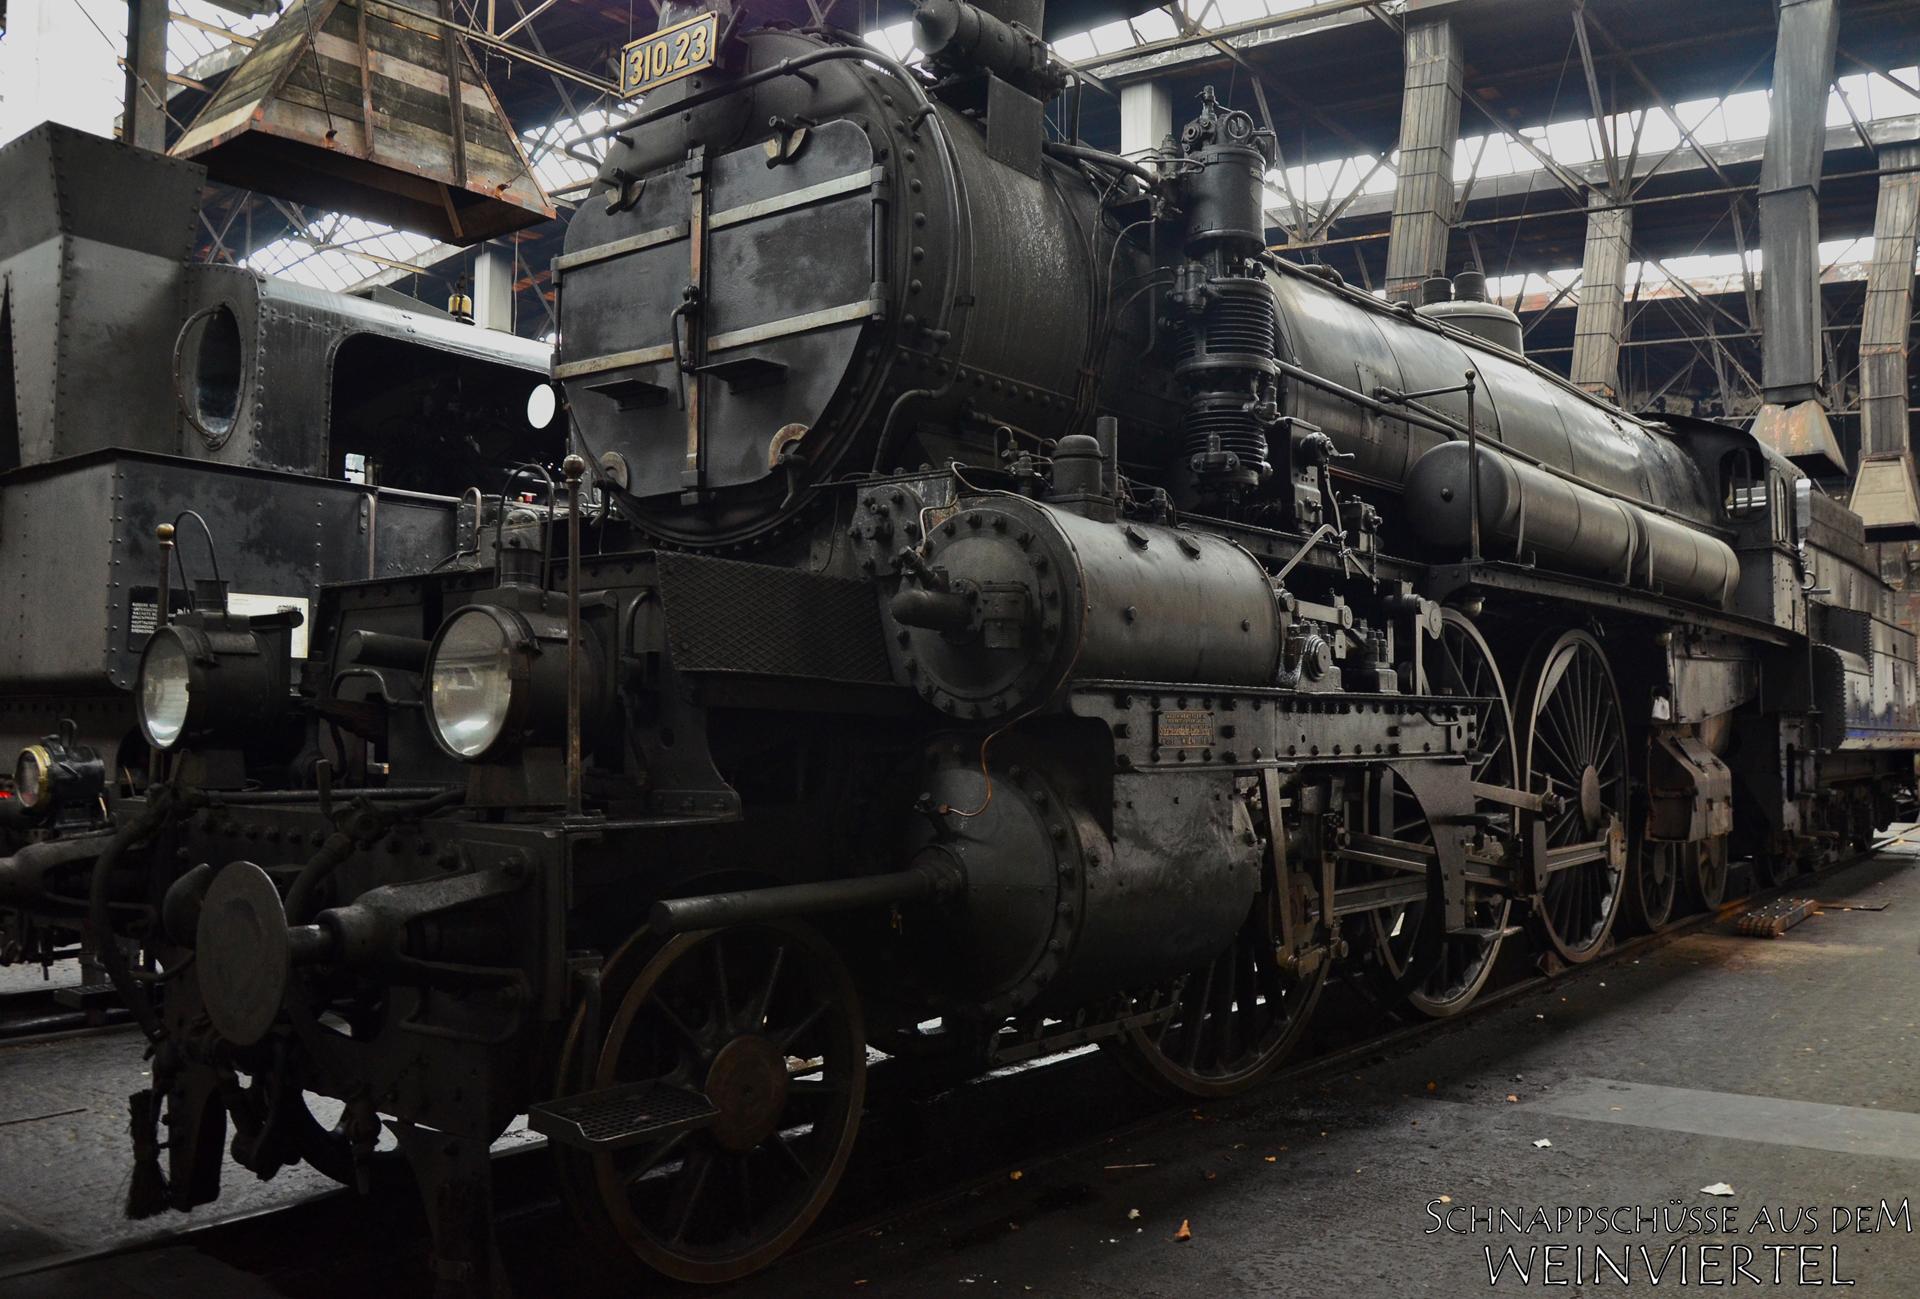 310.23 Dampflok